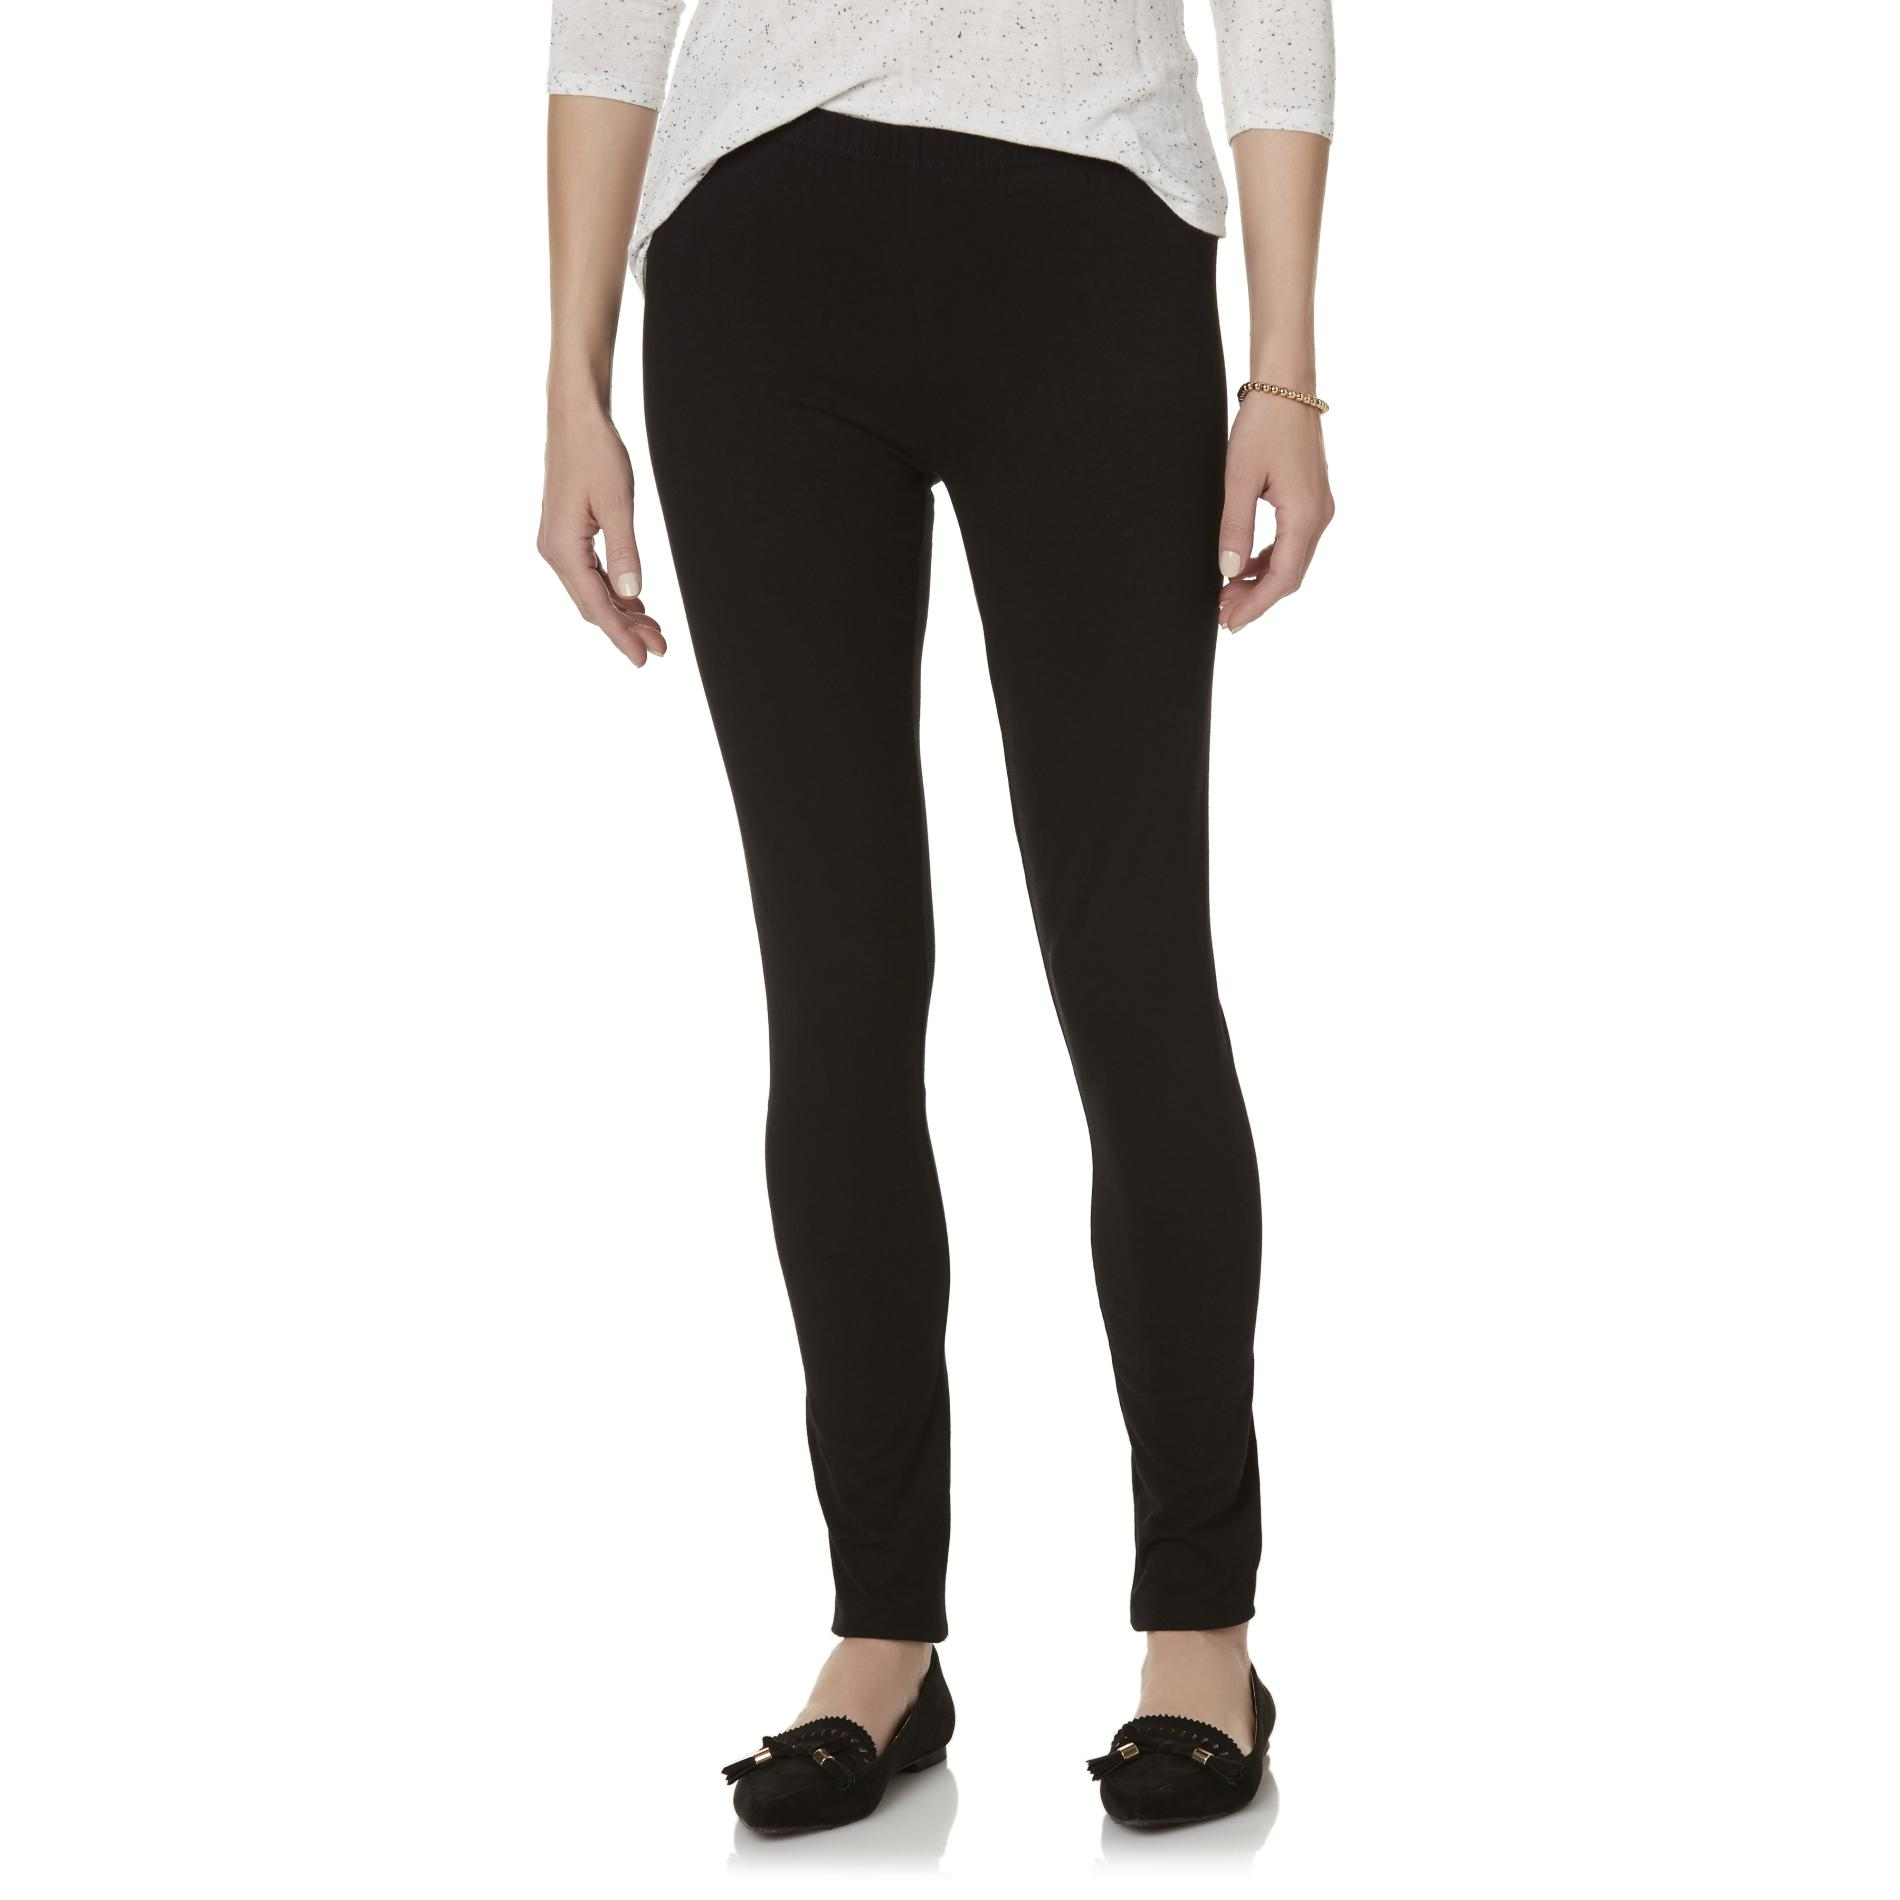 Basic Editions Women' Leggings